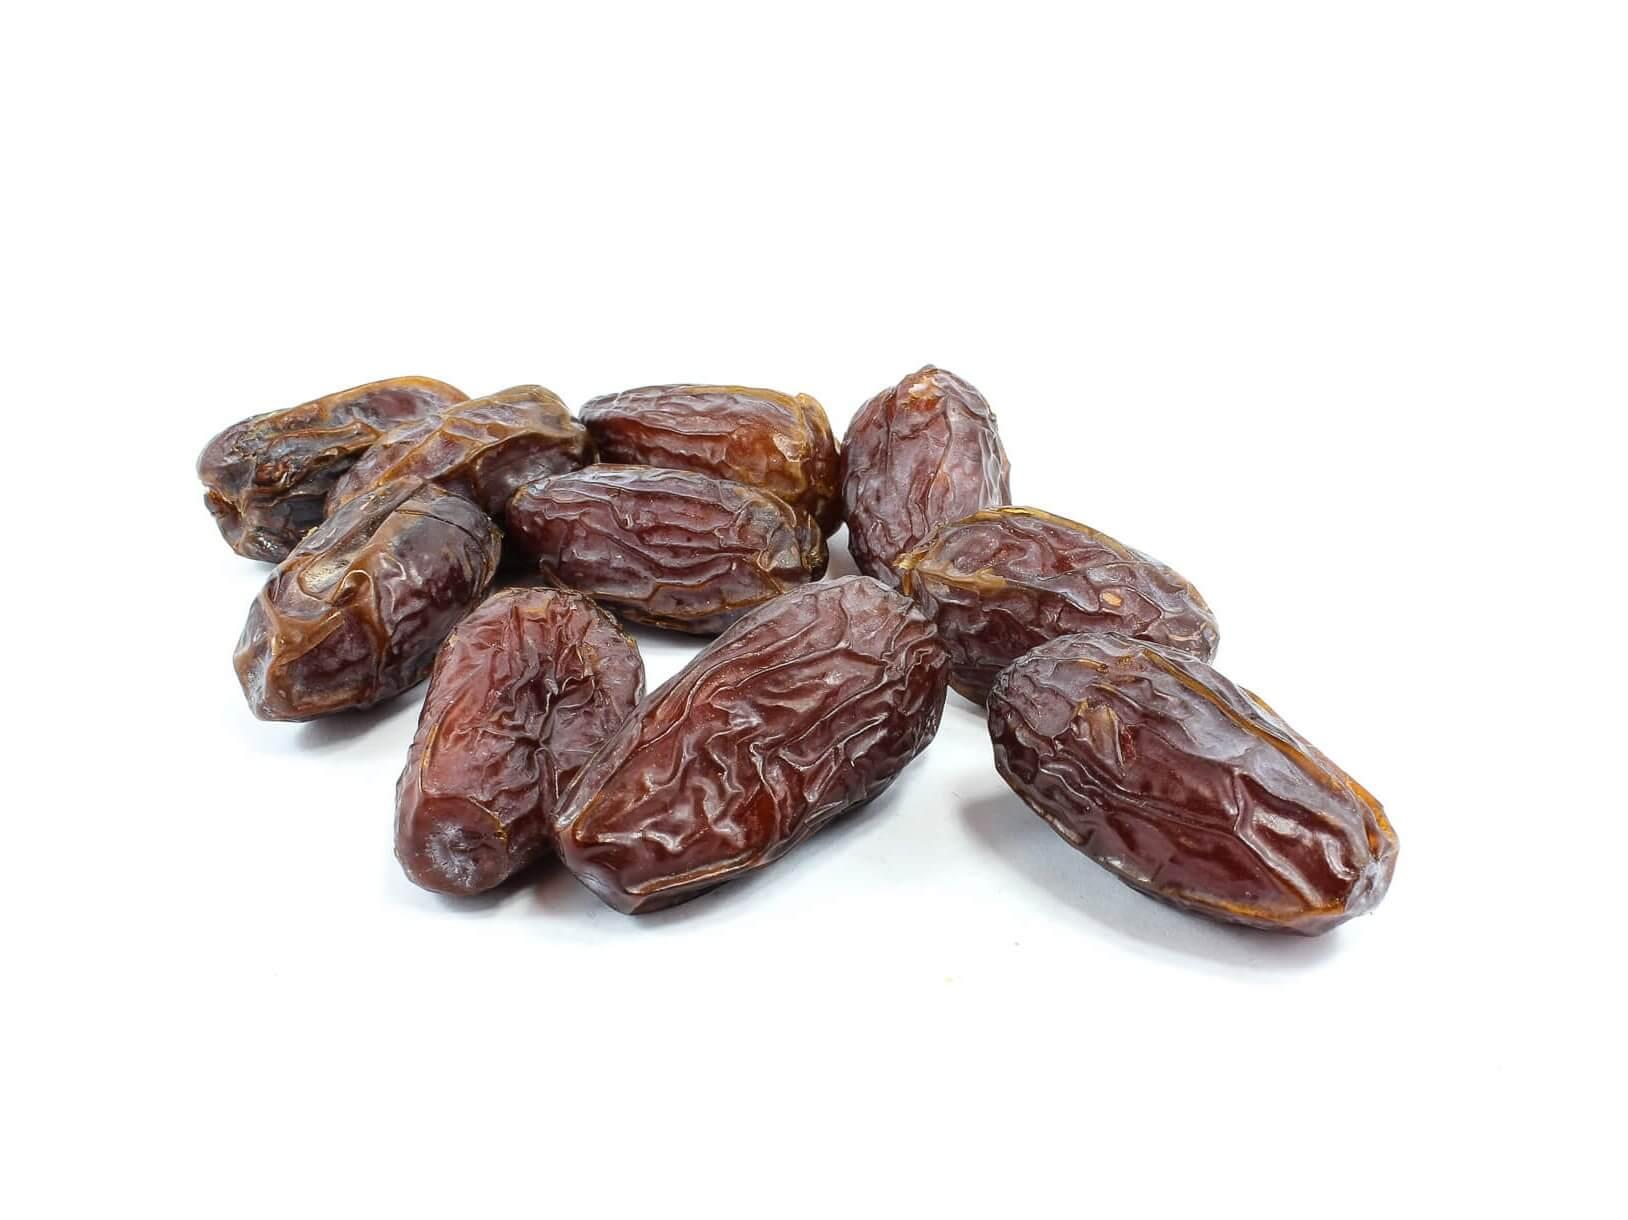 BULK Organic Medjool Dates /200g